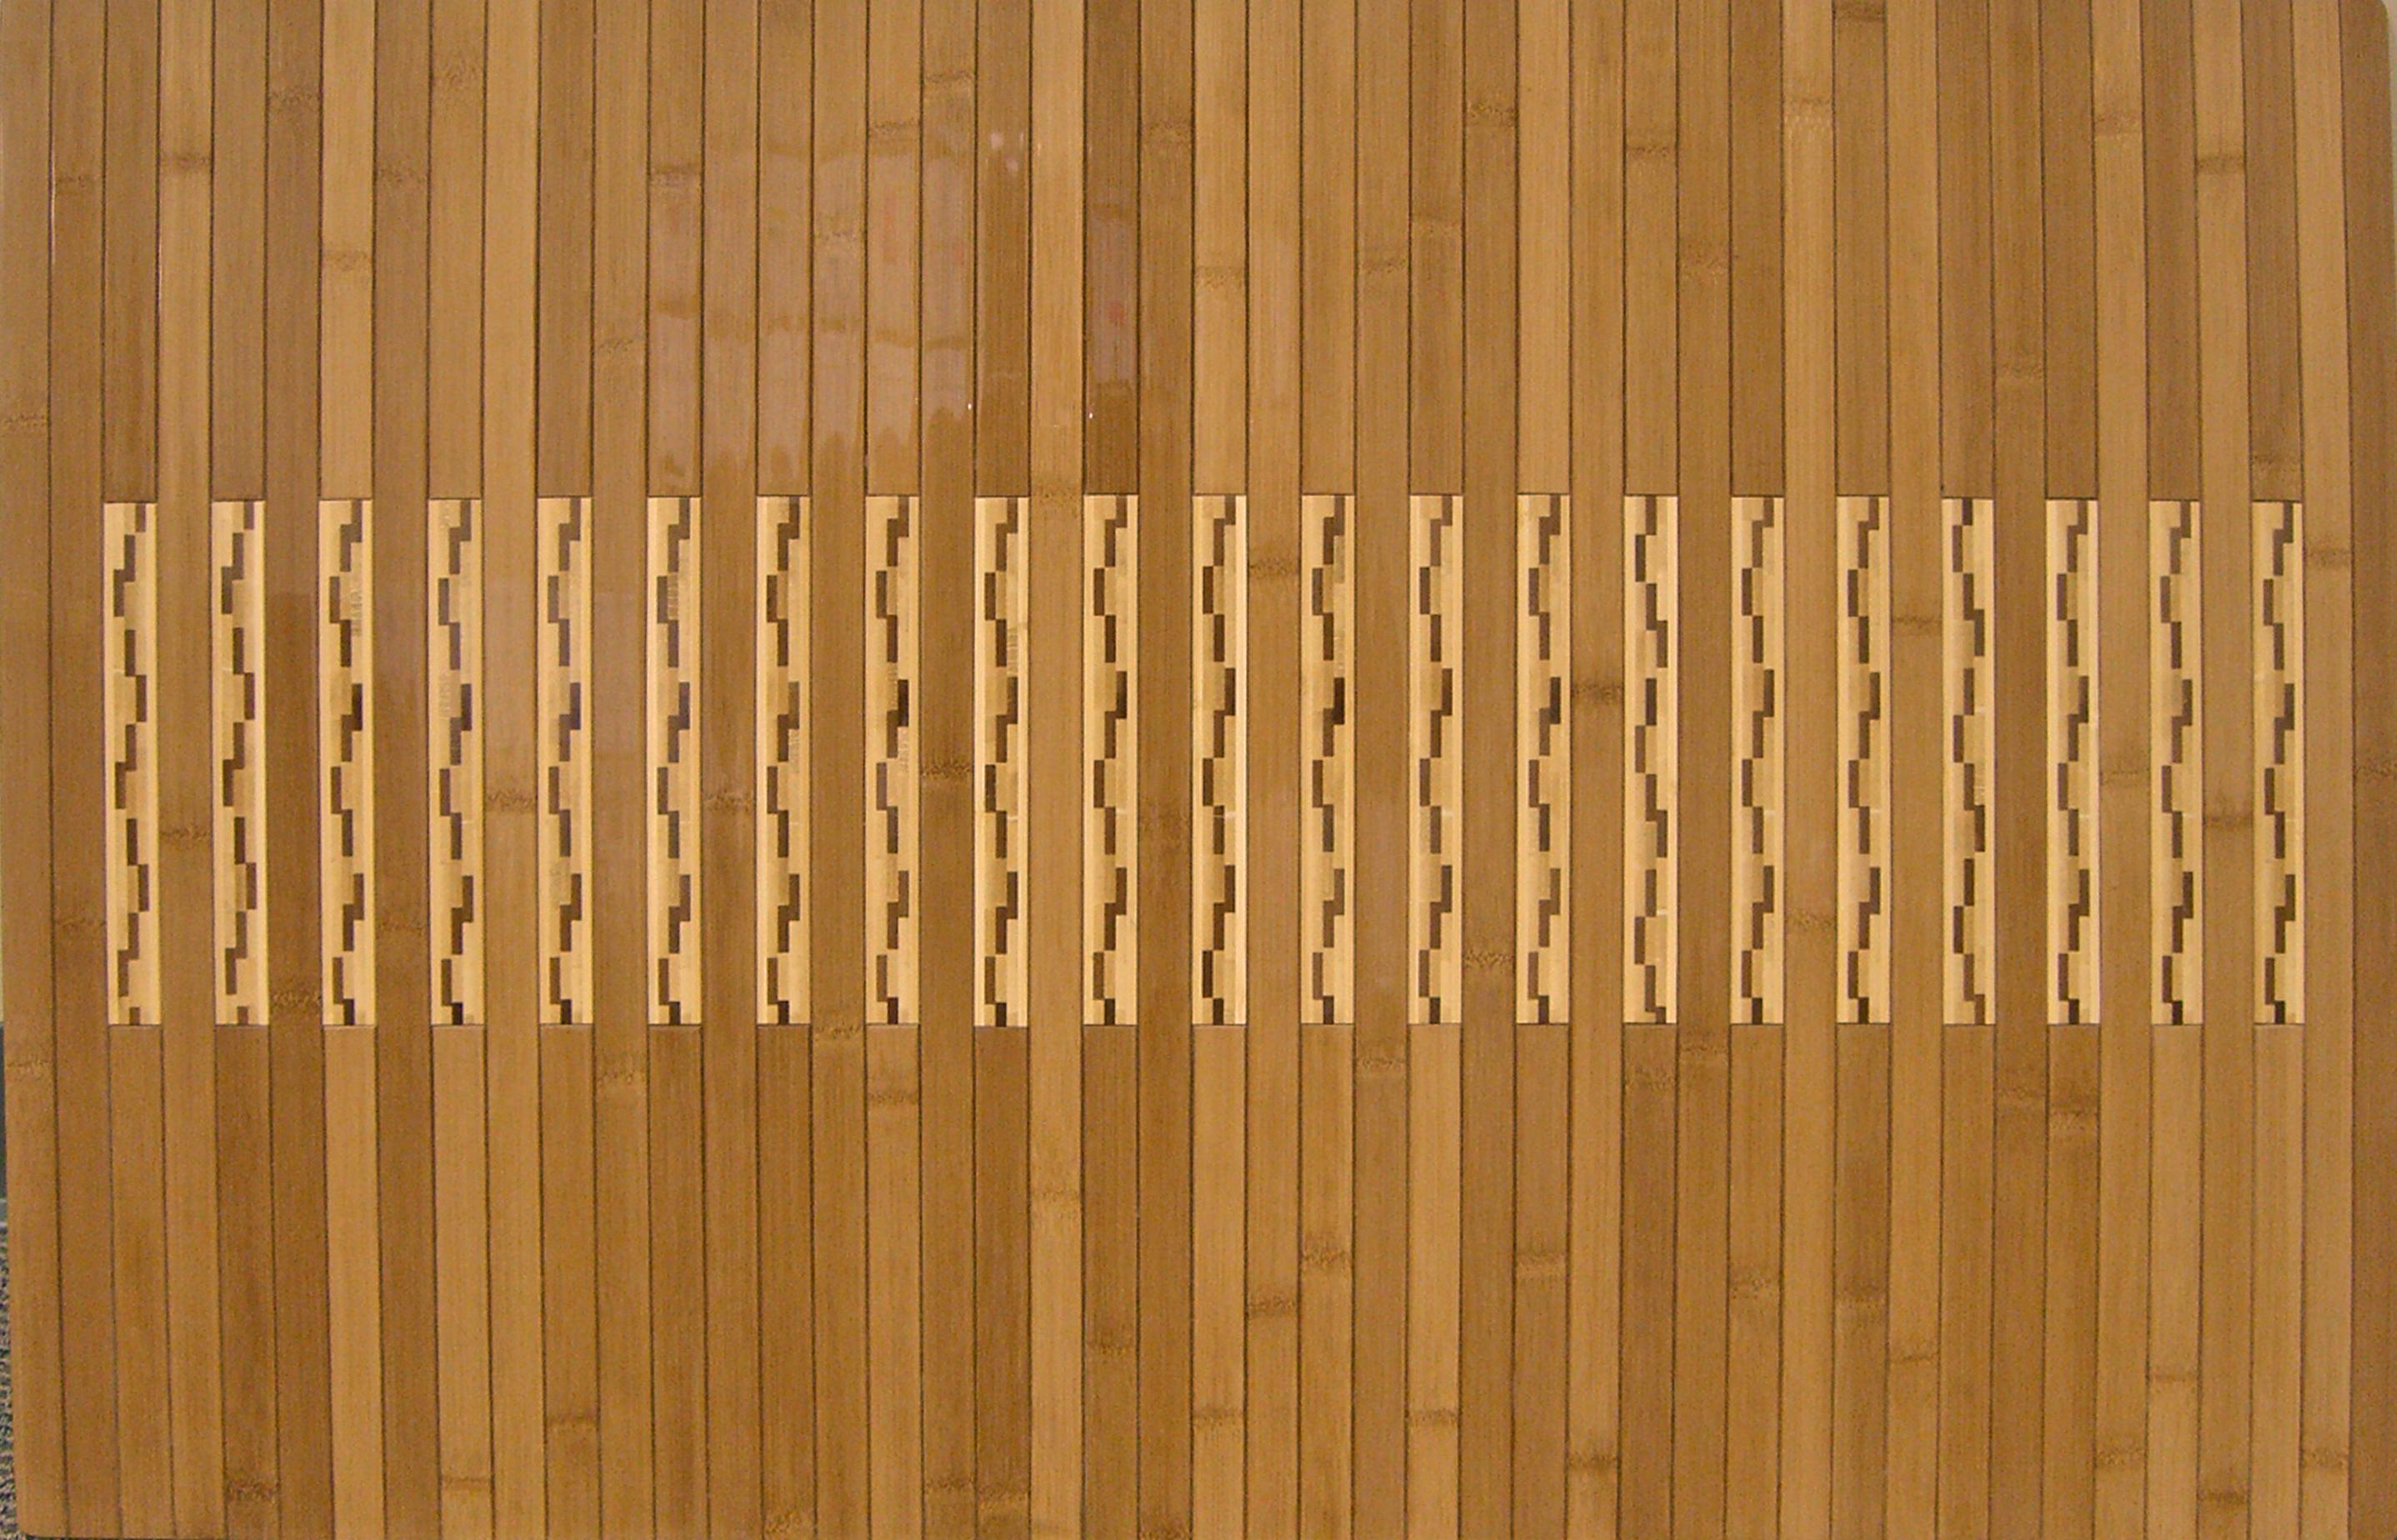 Kitchen Rugs Bamboo 28 Images Anji Mountain